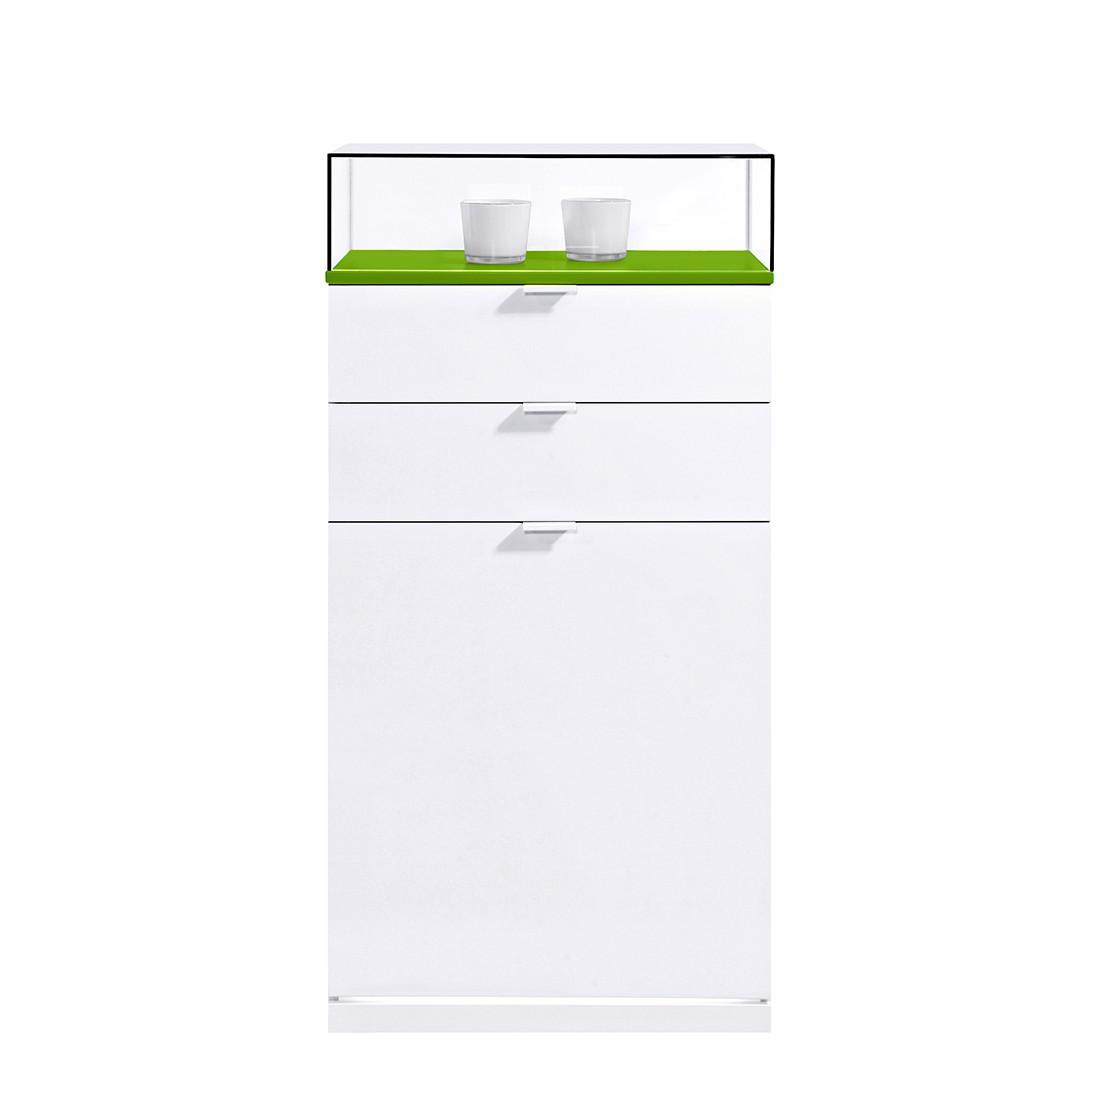 Schuhkommode VIP II - Weiß/Grün (Mit LED-Beleuchtung)